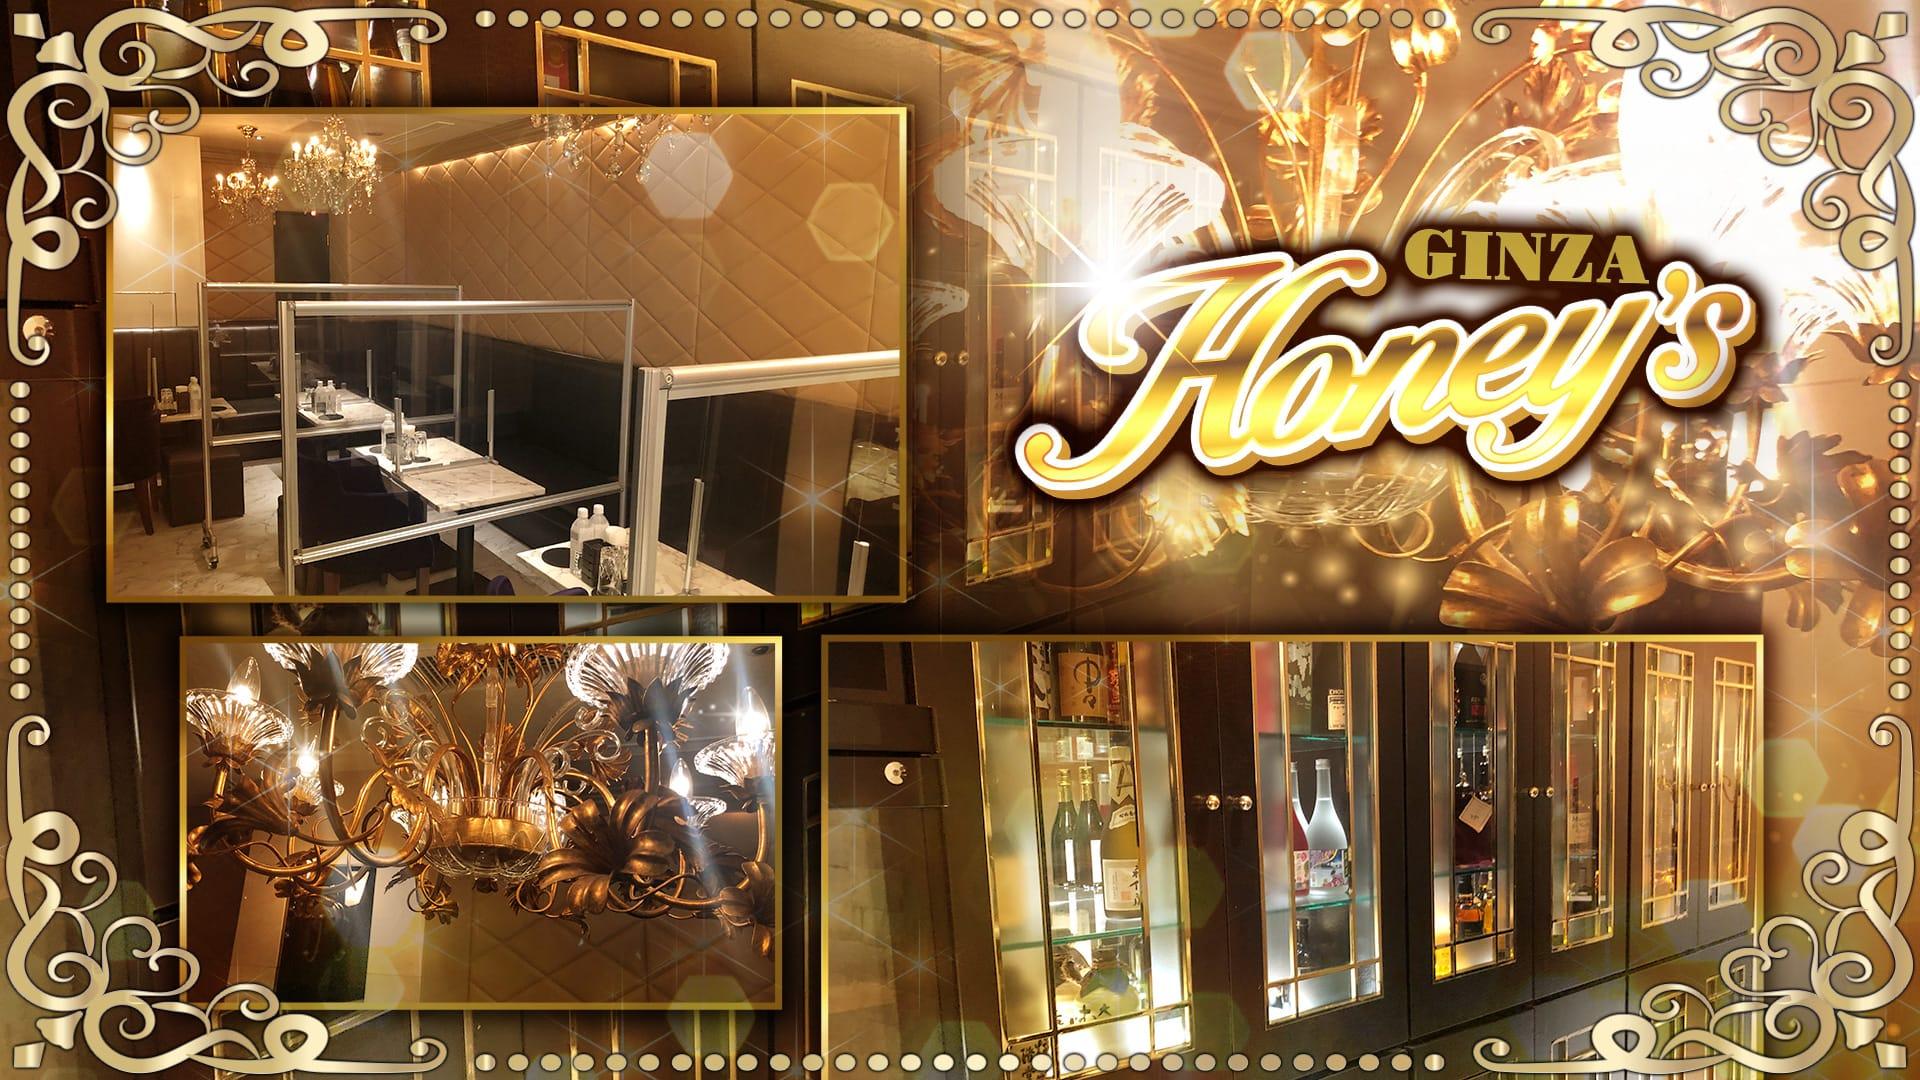 GINZA Honey's(ギンザハニーズ) 銀座ニュークラブ TOP画像